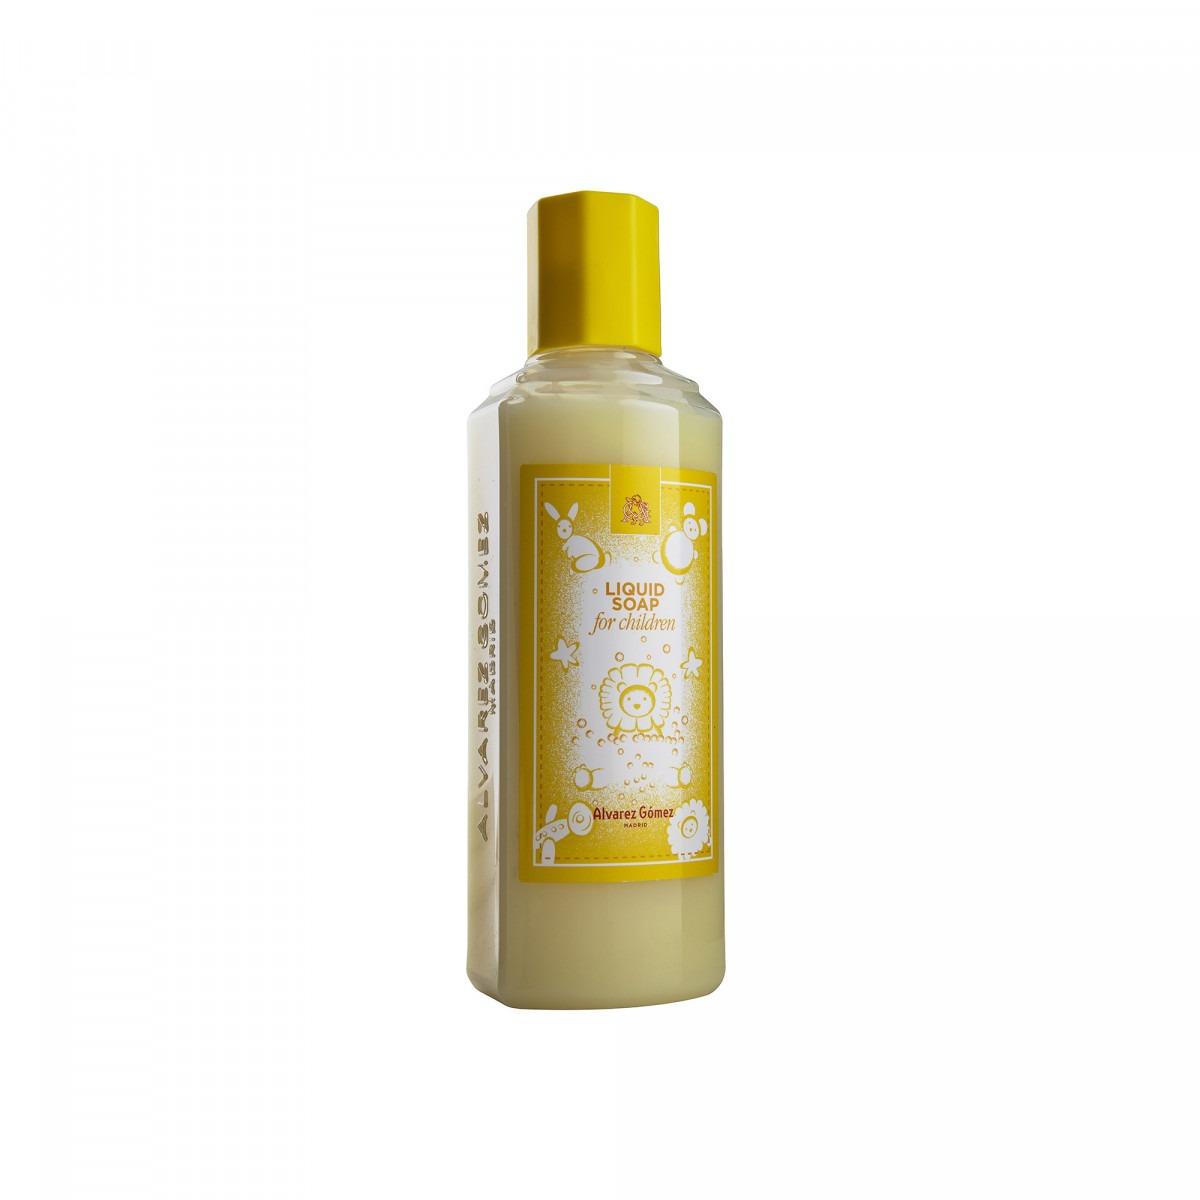 Alvarez Gomez For Children Liquid Soap 300ml